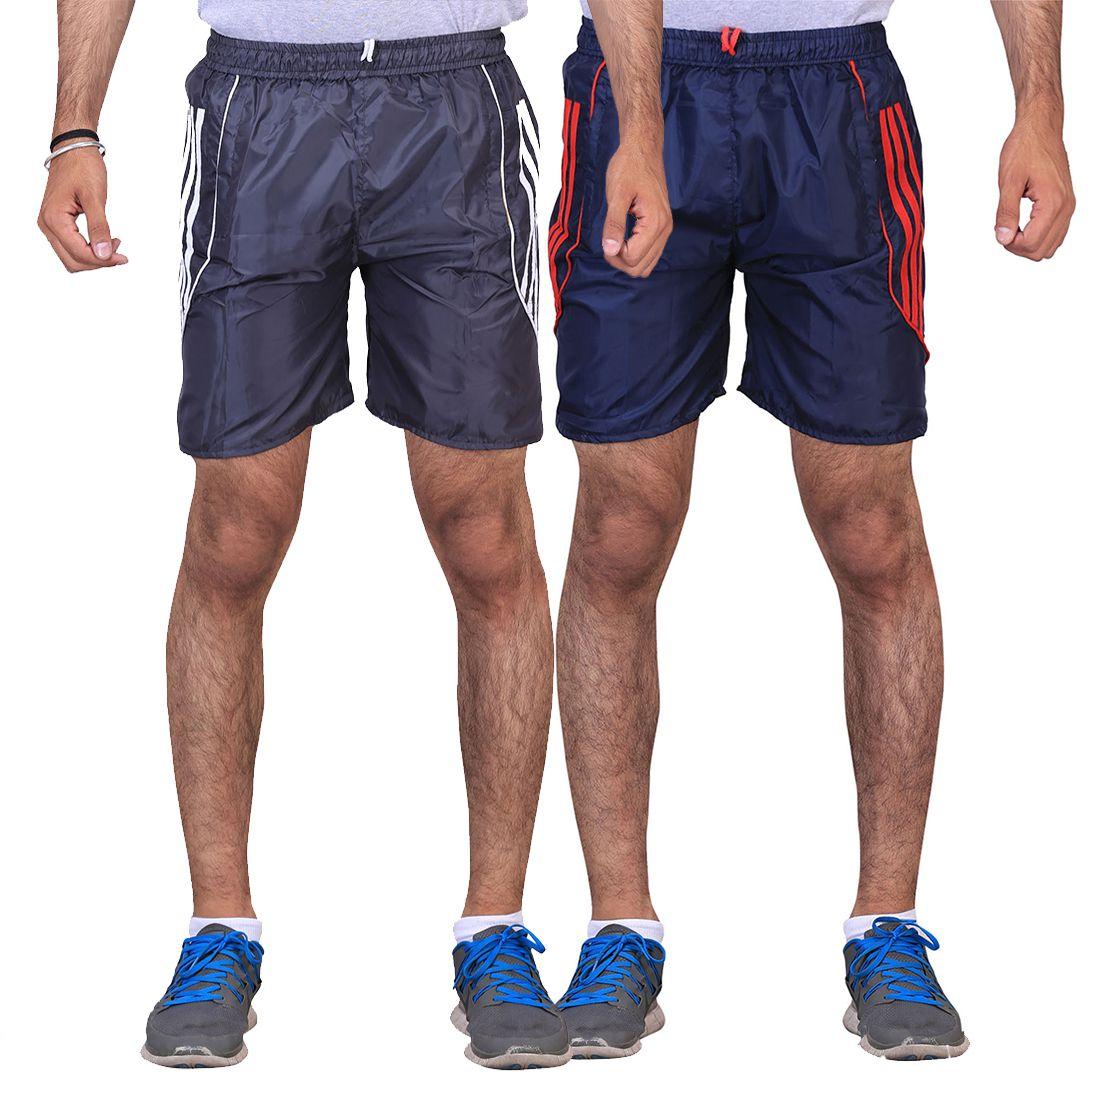 Van Galis Multi Shorts Pack of 2